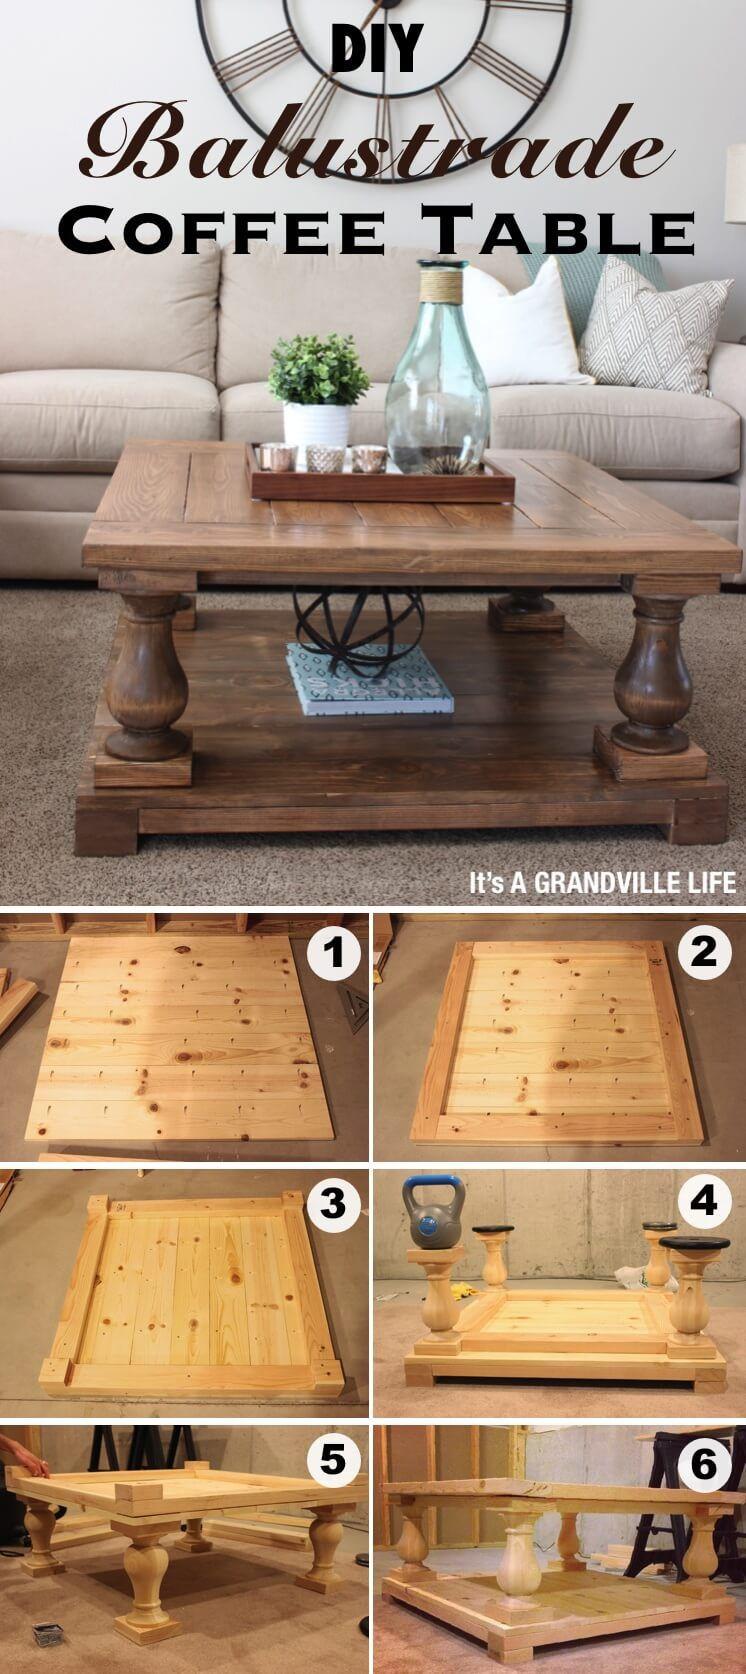 25 DIY Farmhouse Coffee Table Ideas that